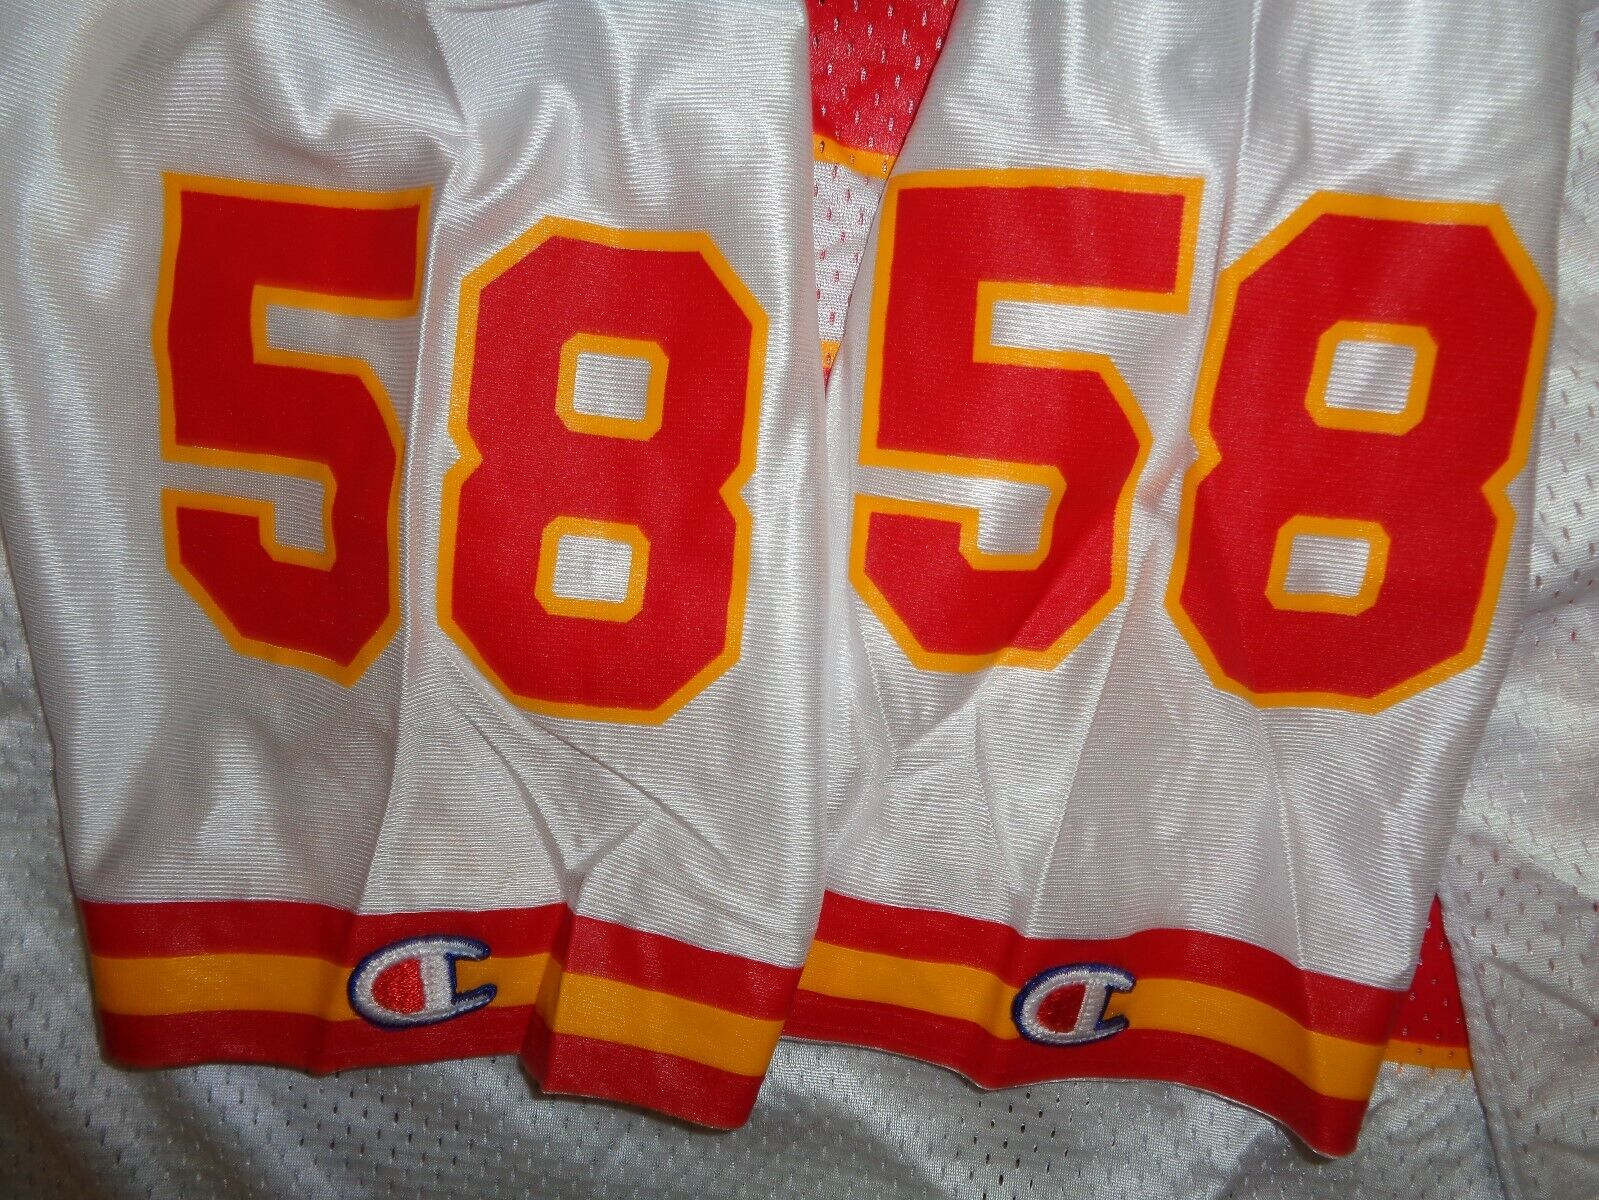 NWT AUTHENTIC DERRICK THOMAS CHAMPION KC KANSAS CITY CHIEFS NFL GAME JERSEY SZ L - $49.99